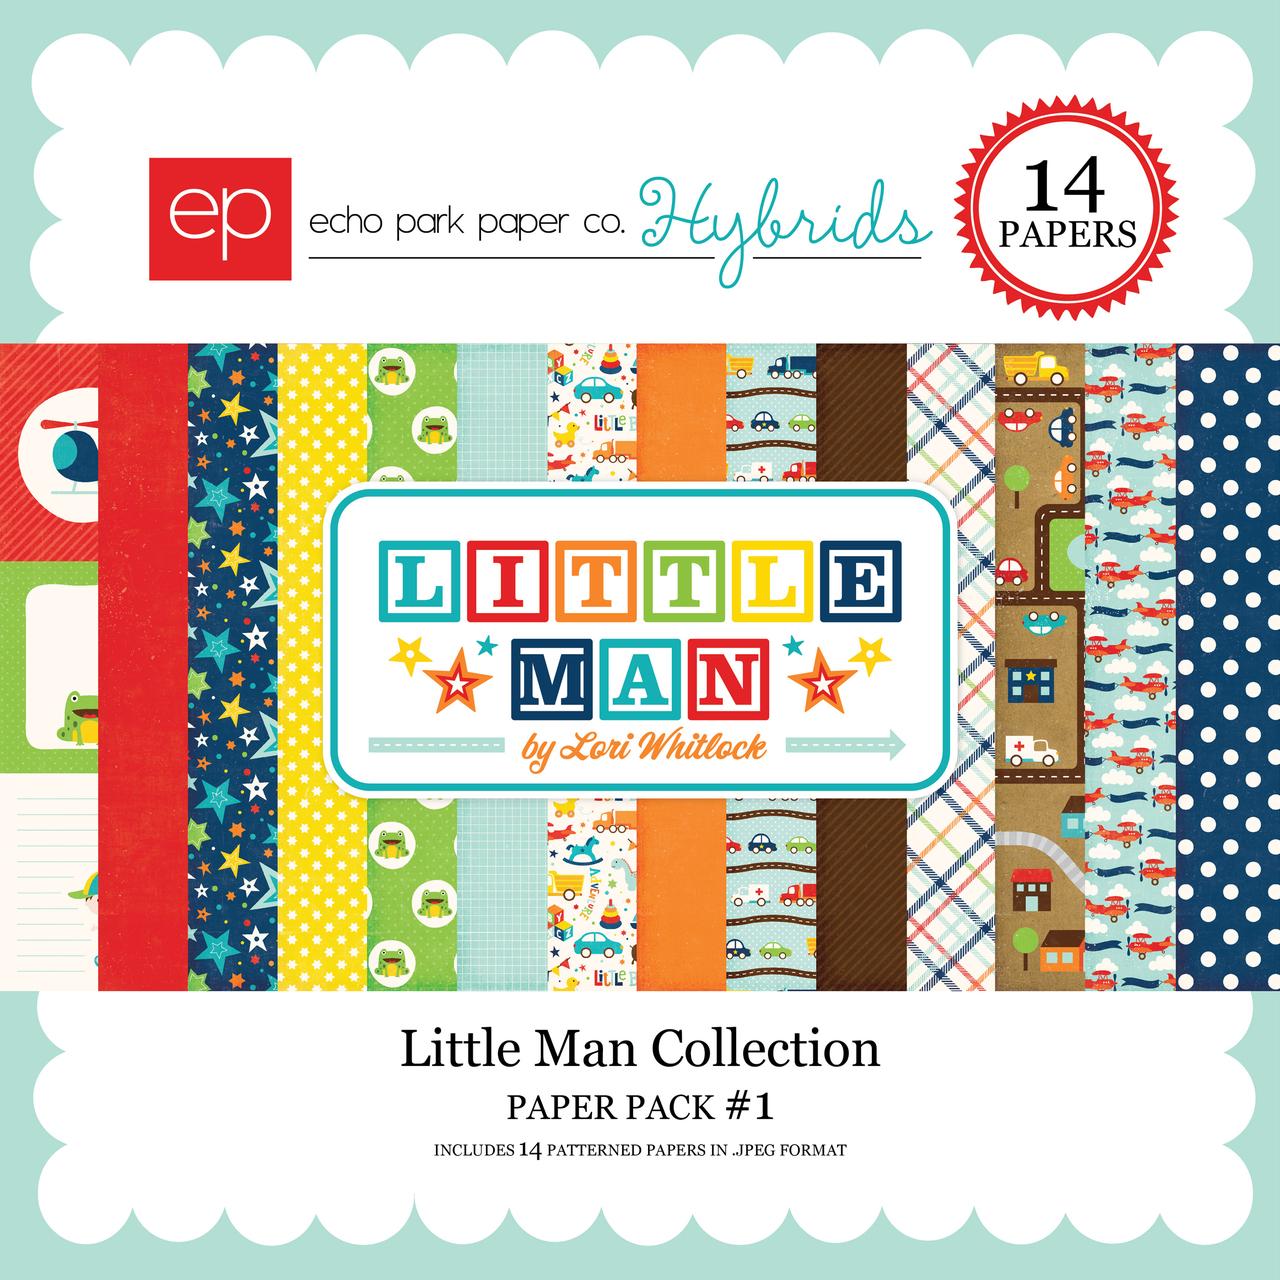 Little Man Paper Pack 1